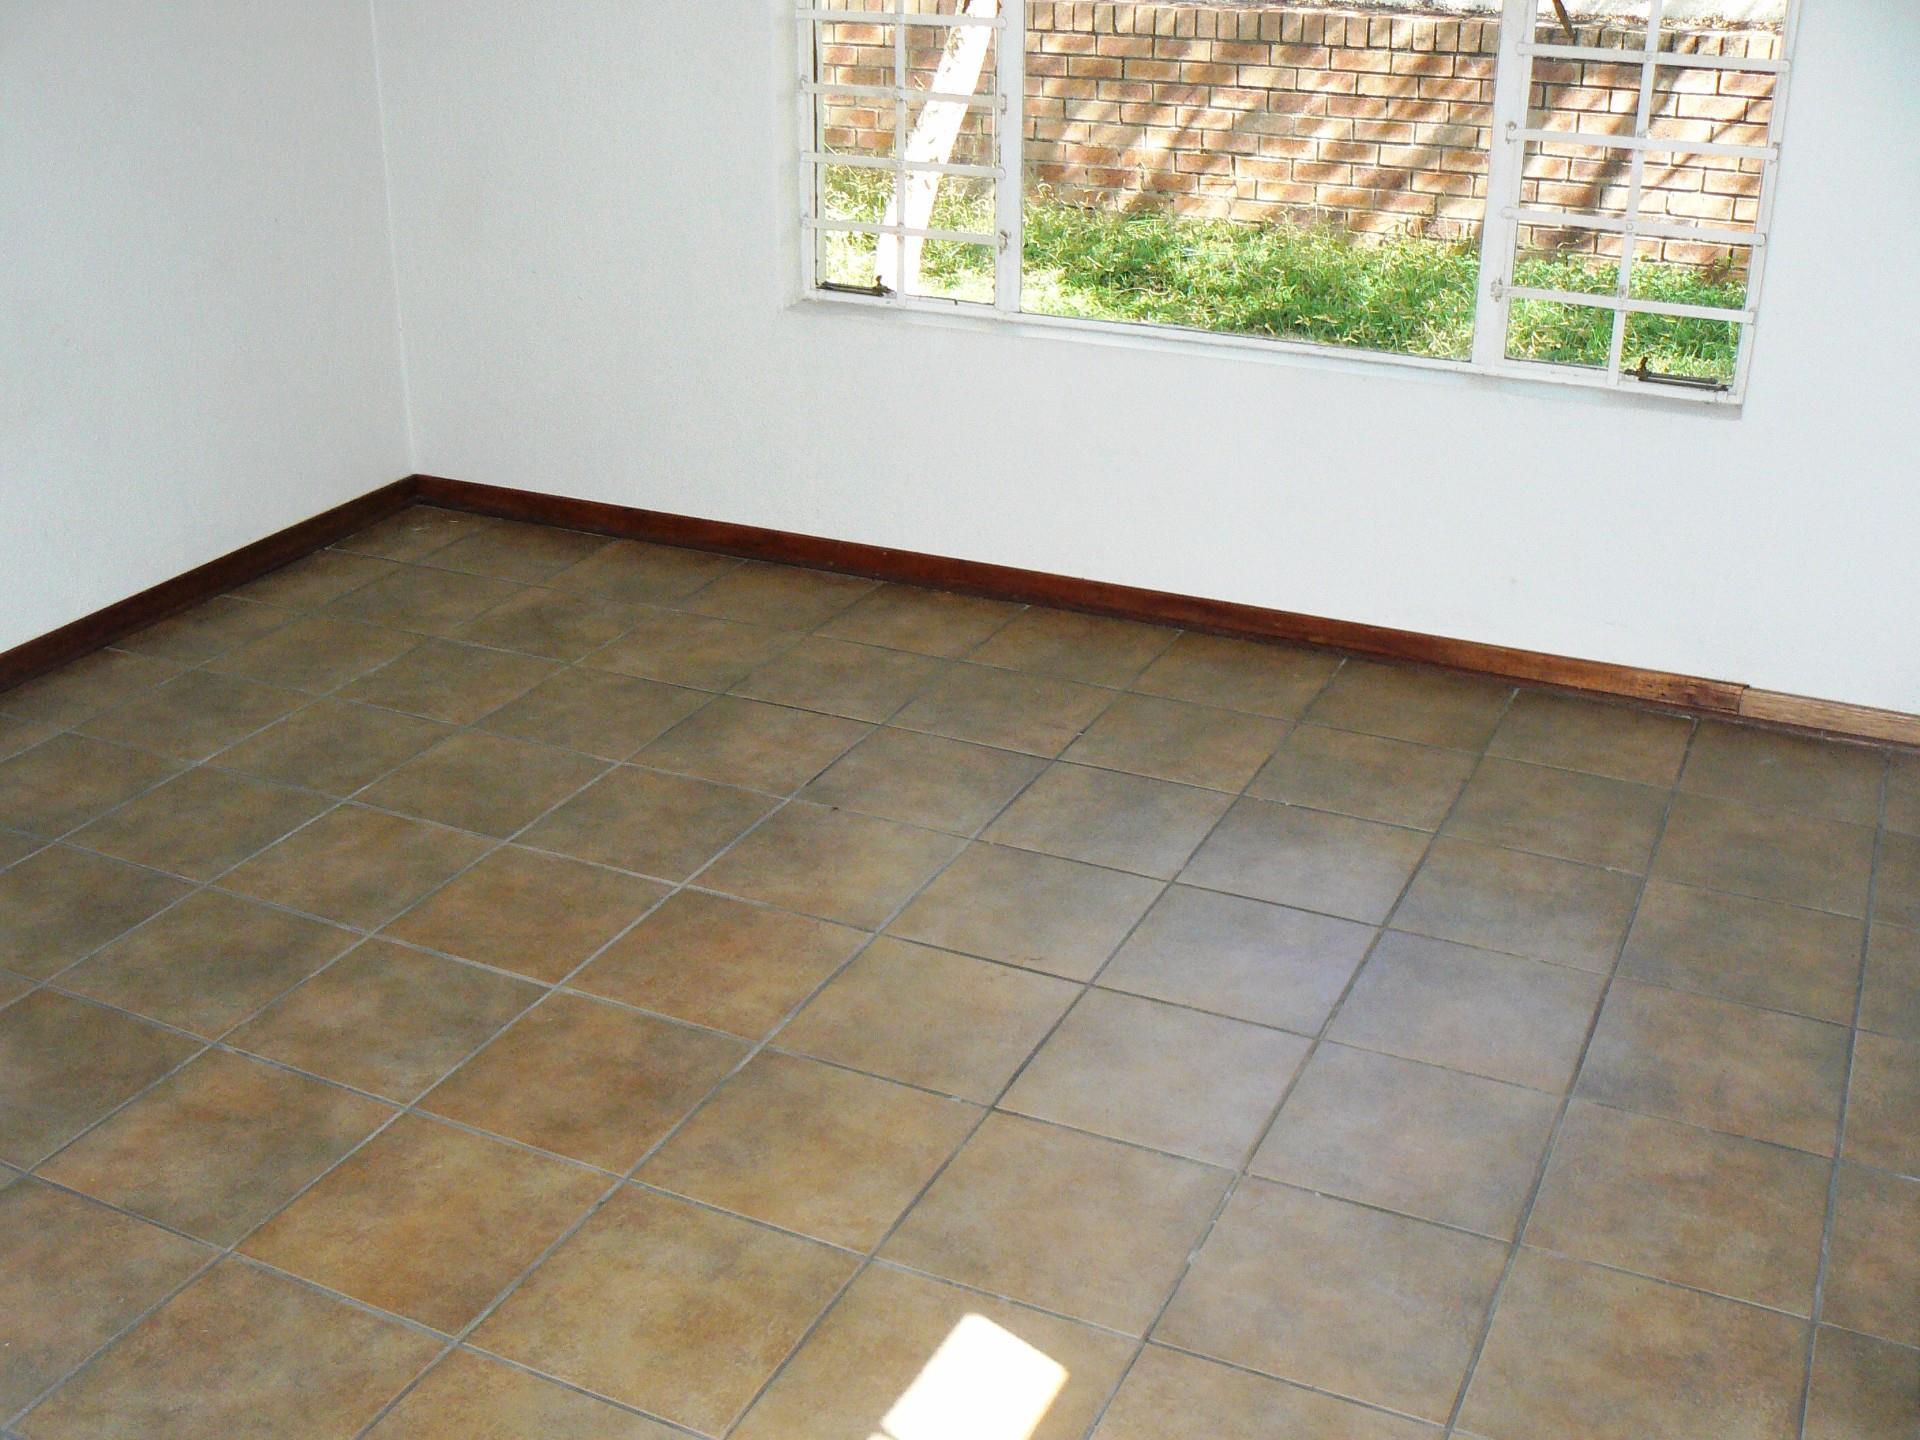 West Acres & Ext property for sale. Ref No: 13485783. Picture no 9